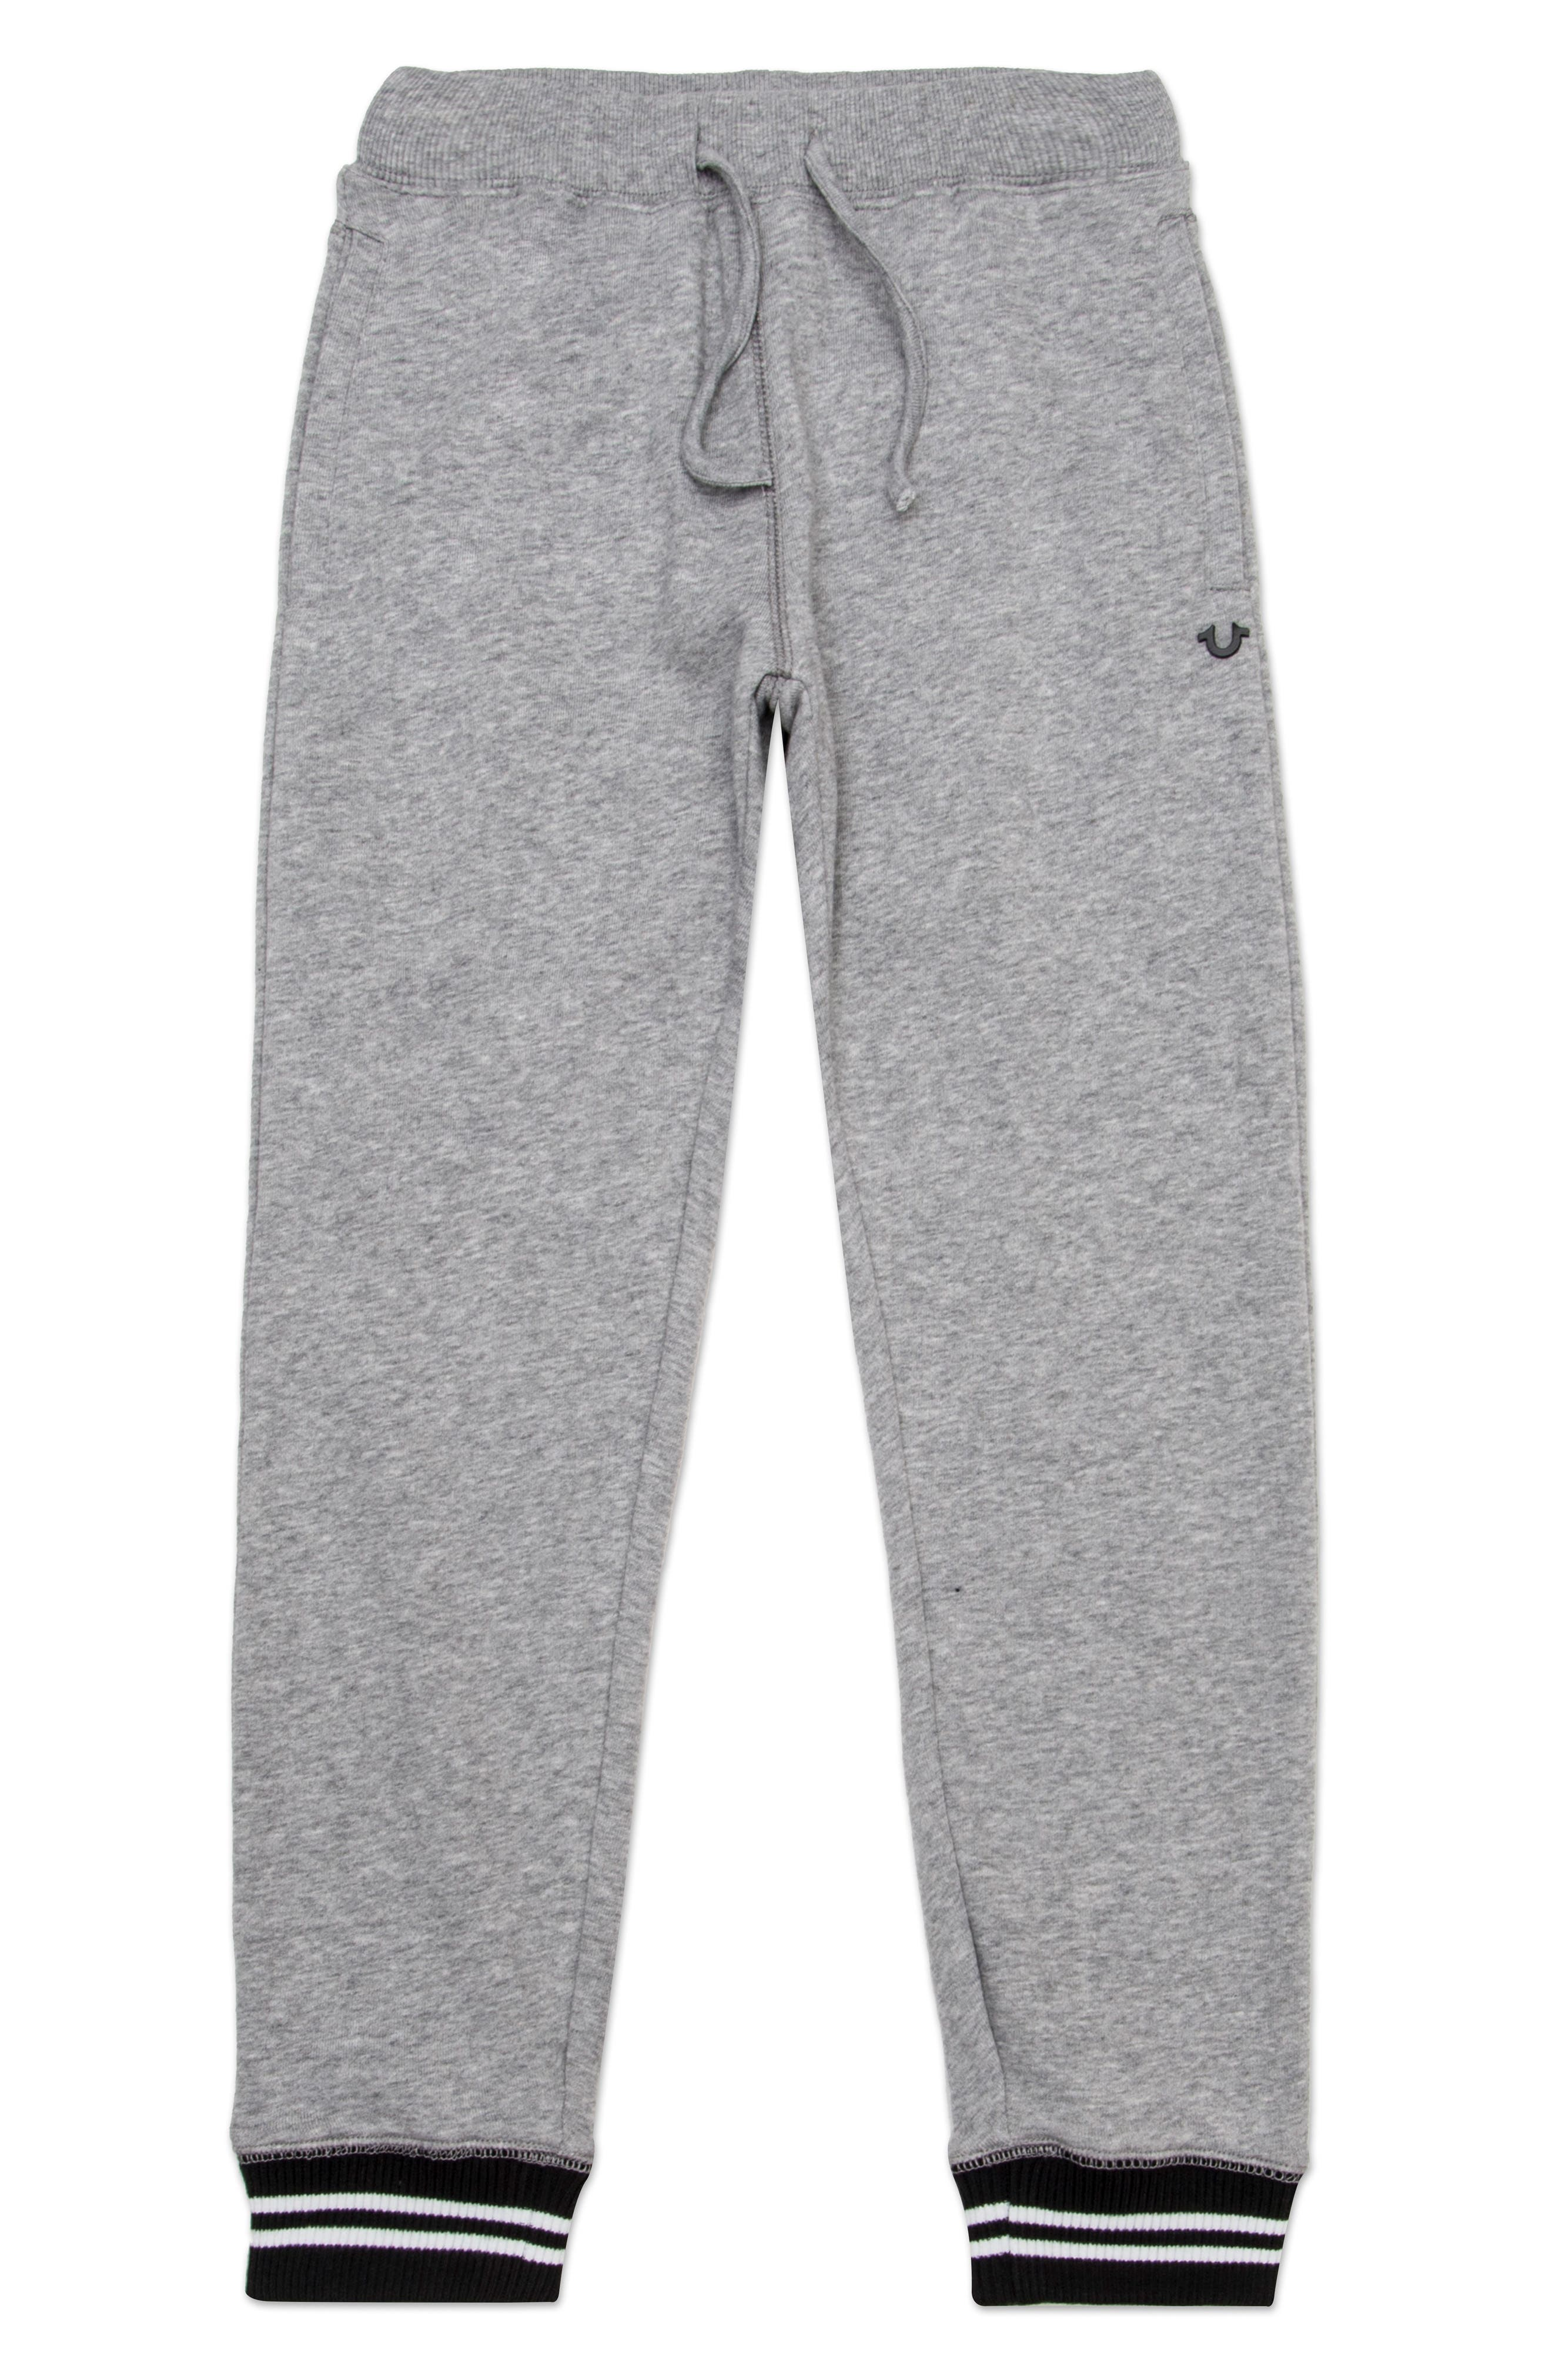 Tipped Sweatpants,                             Main thumbnail 1, color,                             091